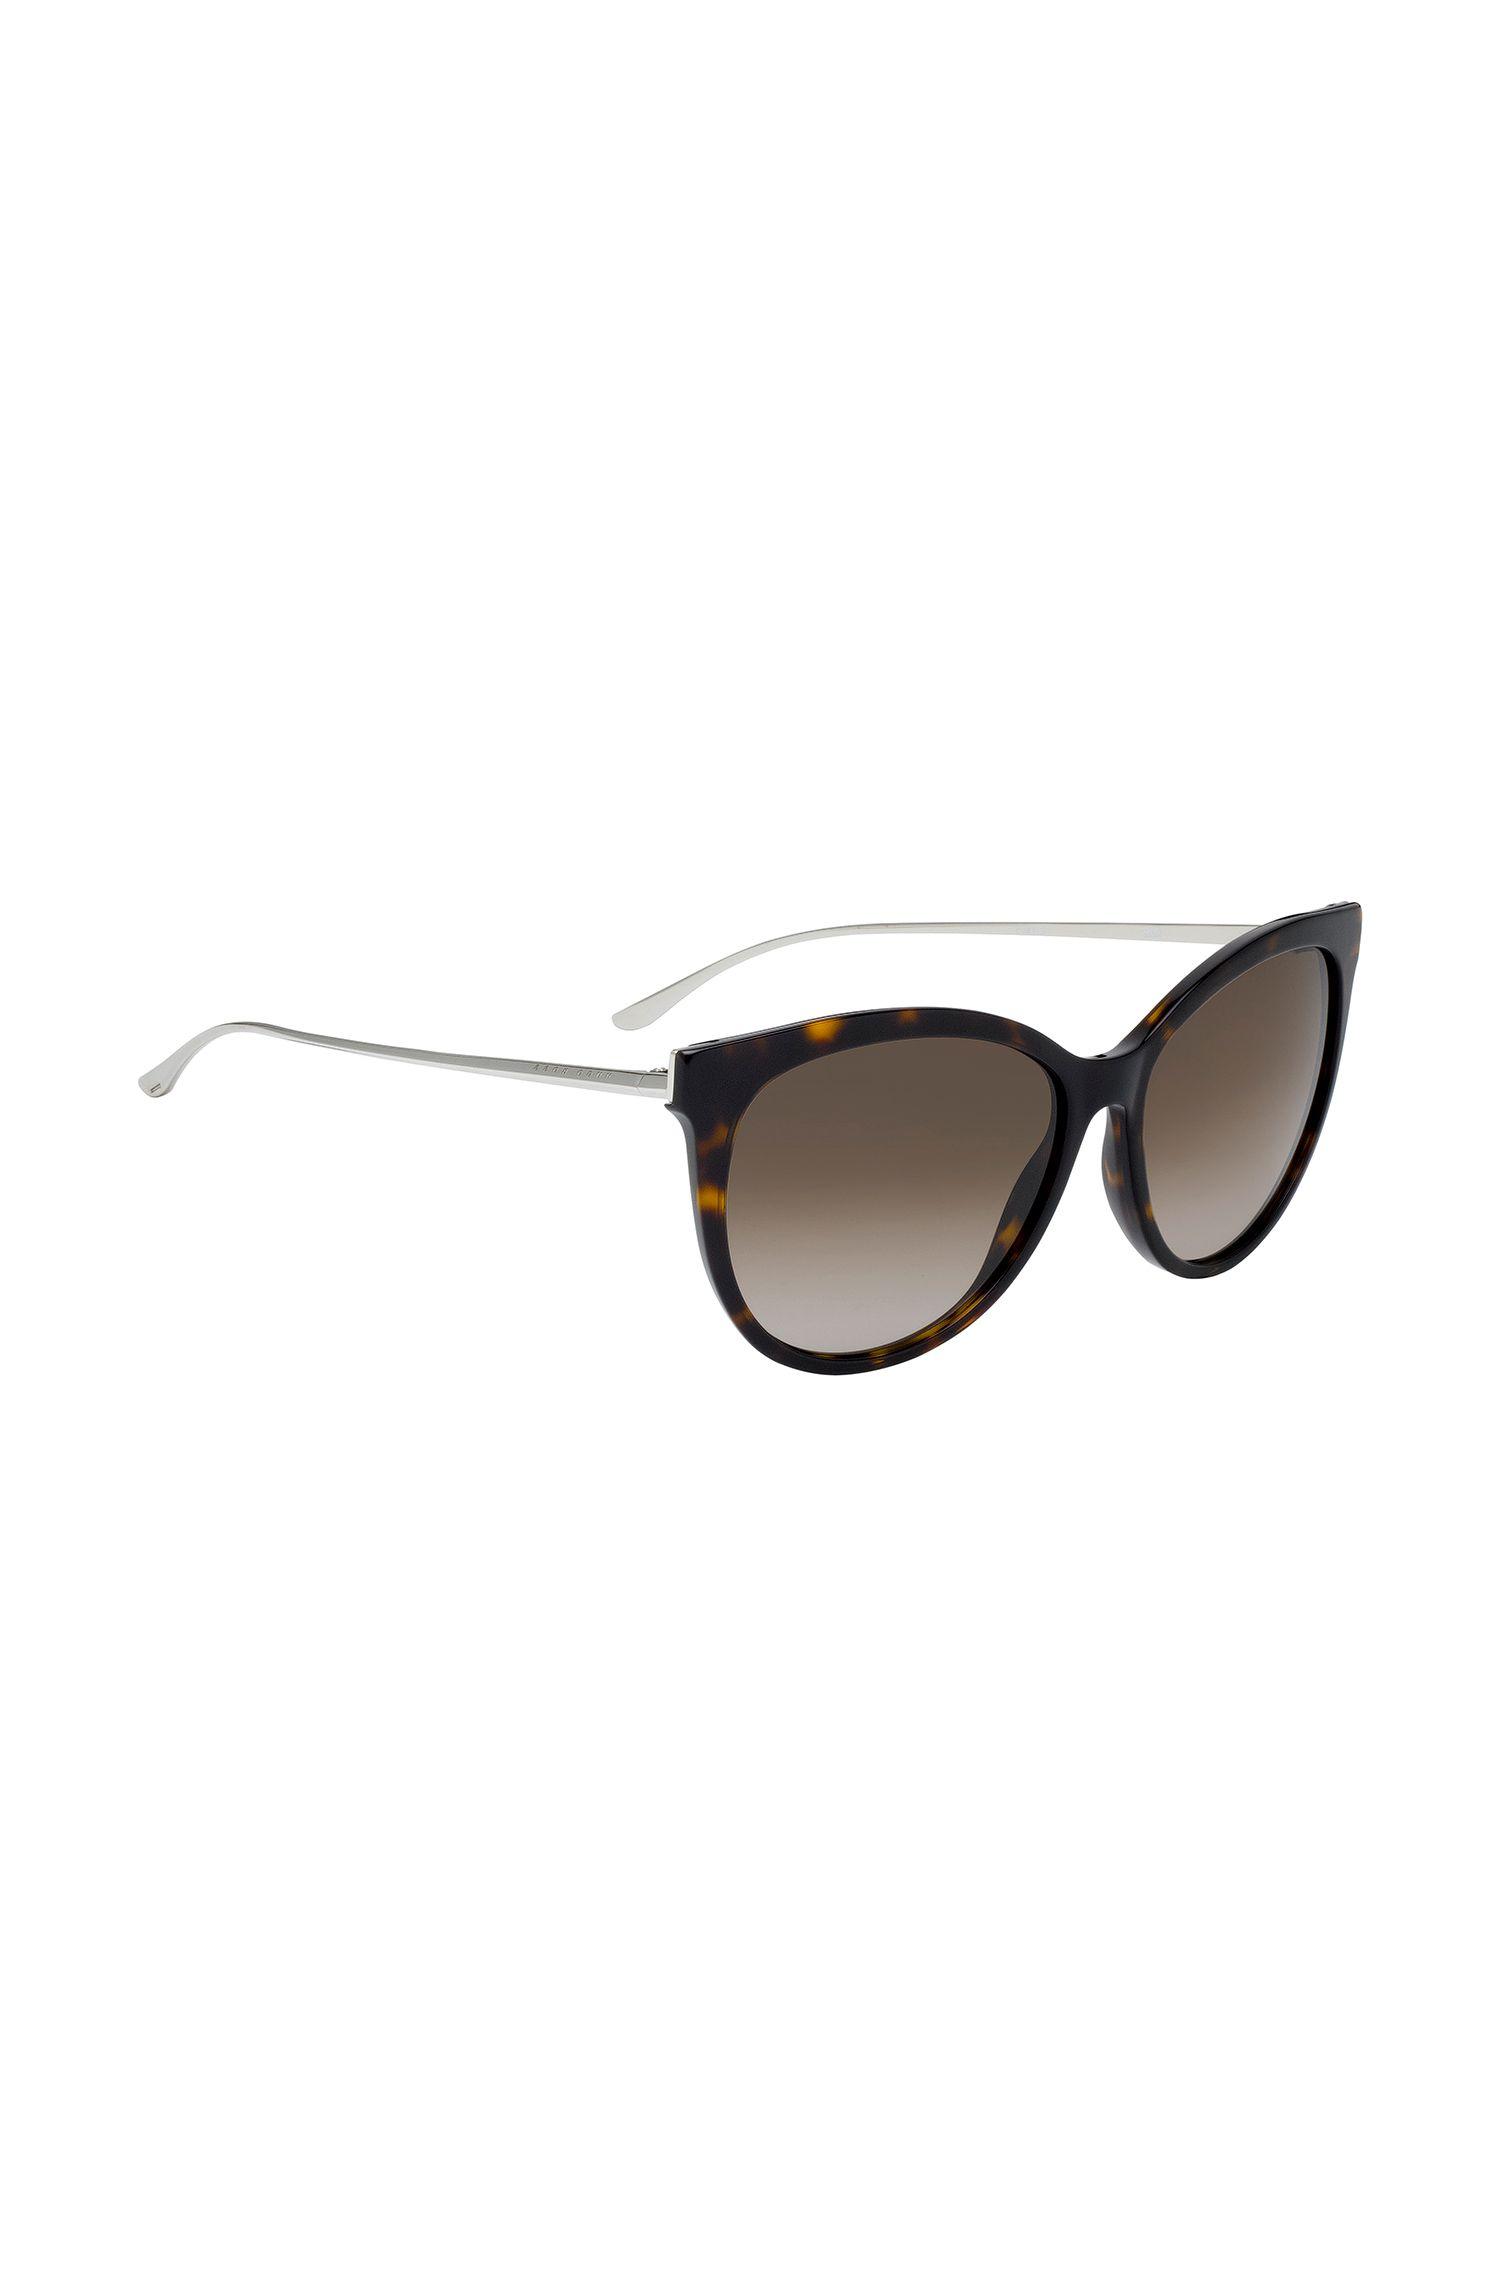 'BOSS 0892S' | Tortoiseshell Cat-Eye Sunglasses